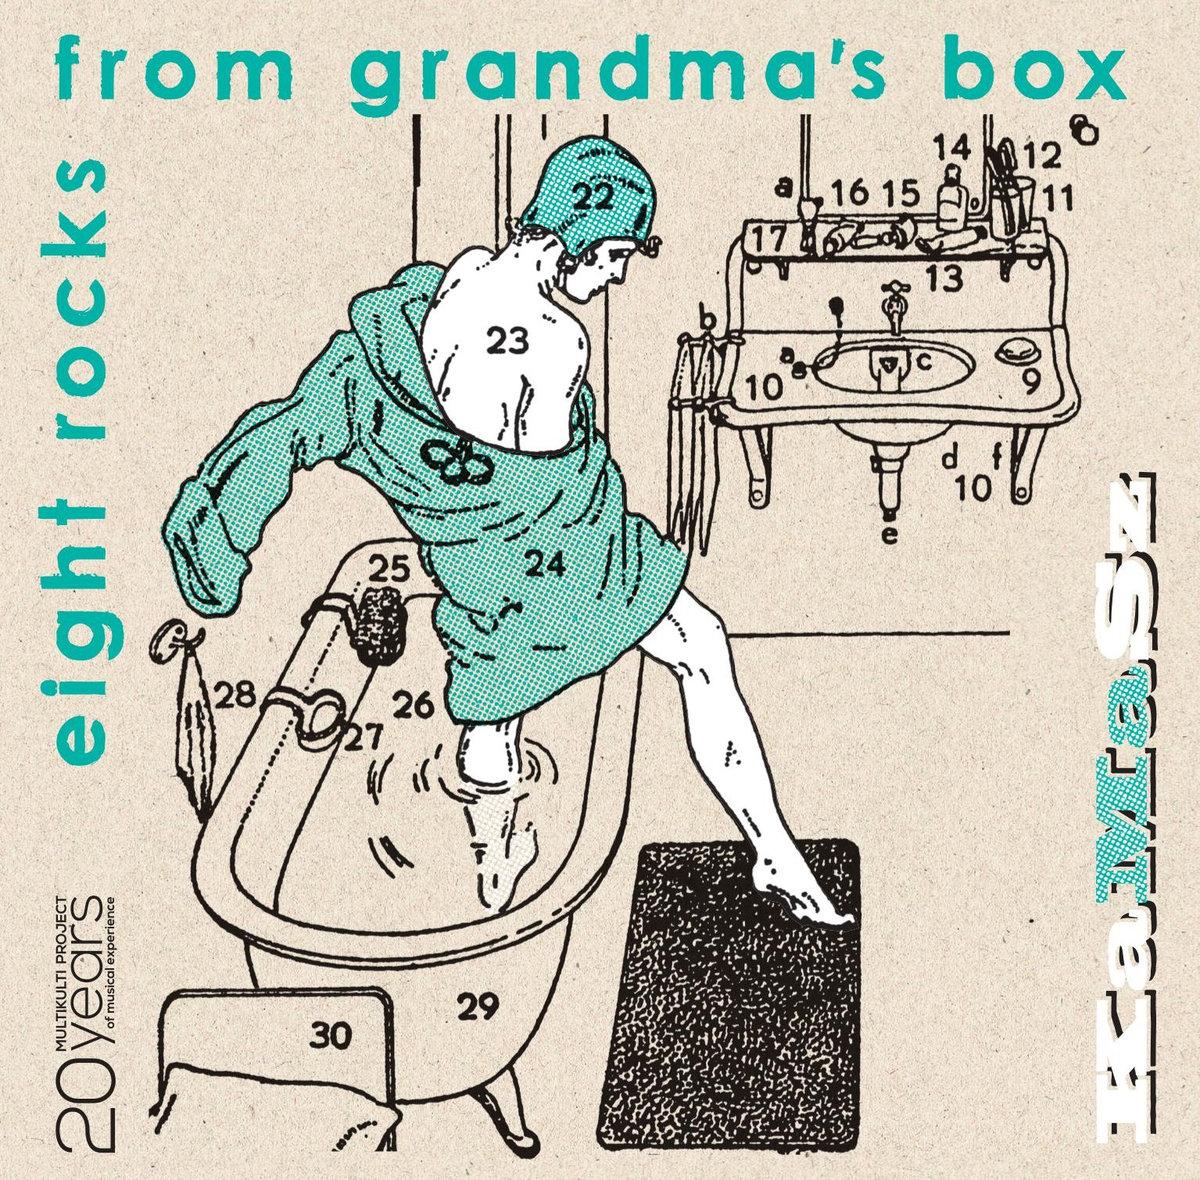 Eight rocks from grandma's box